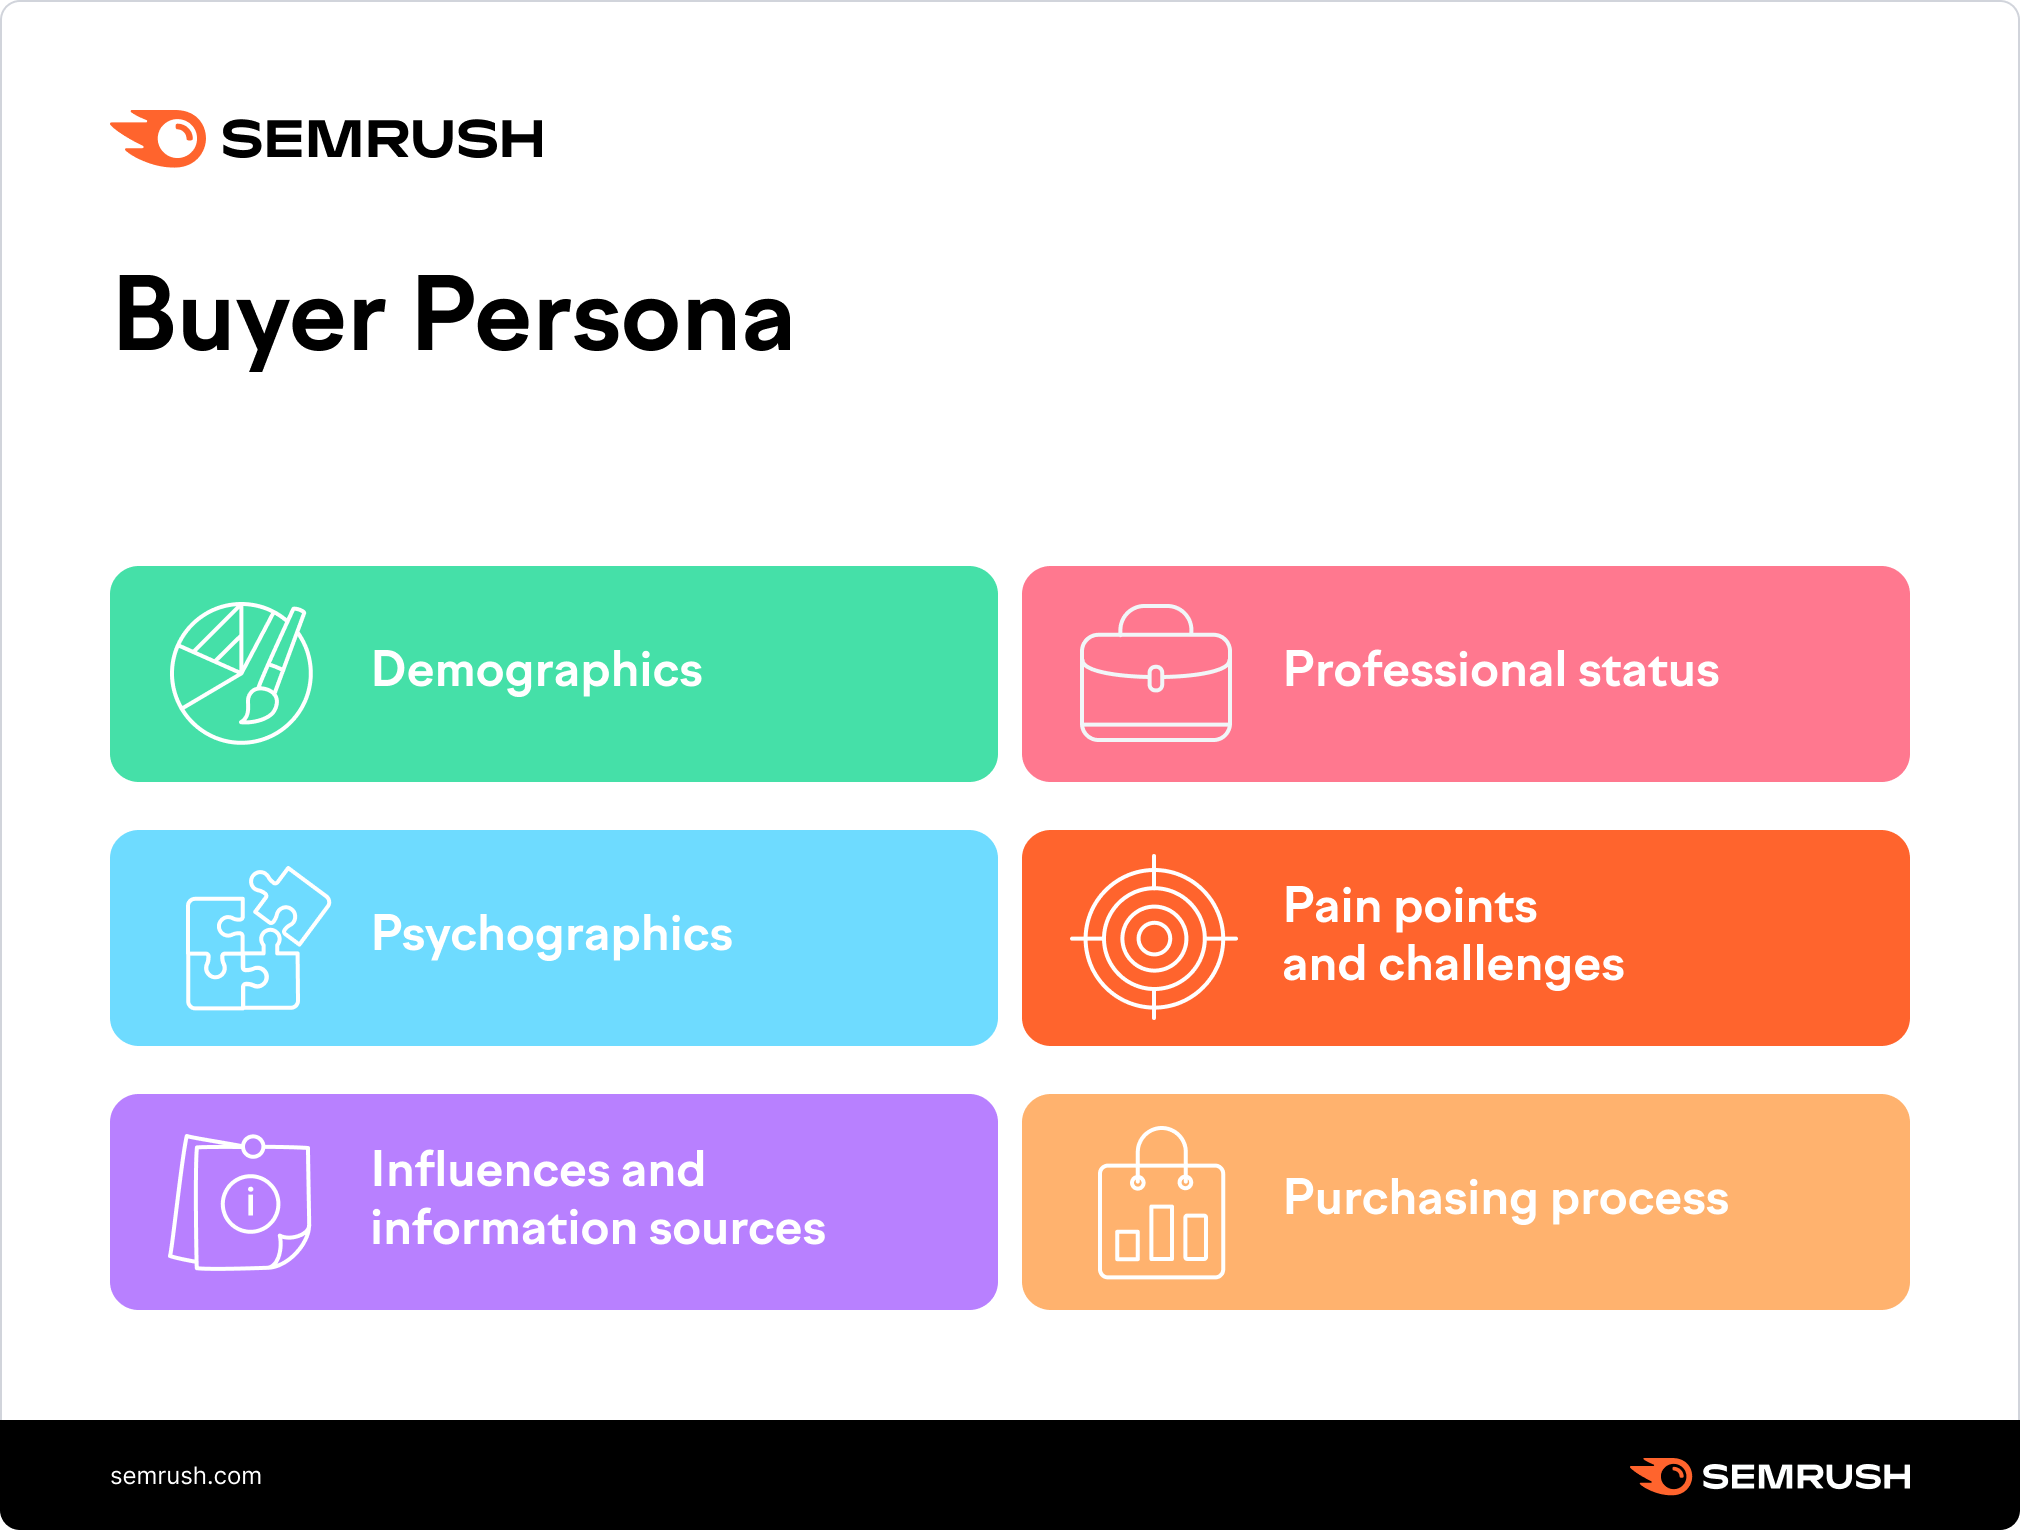 Characteristics of the buyer persona profile